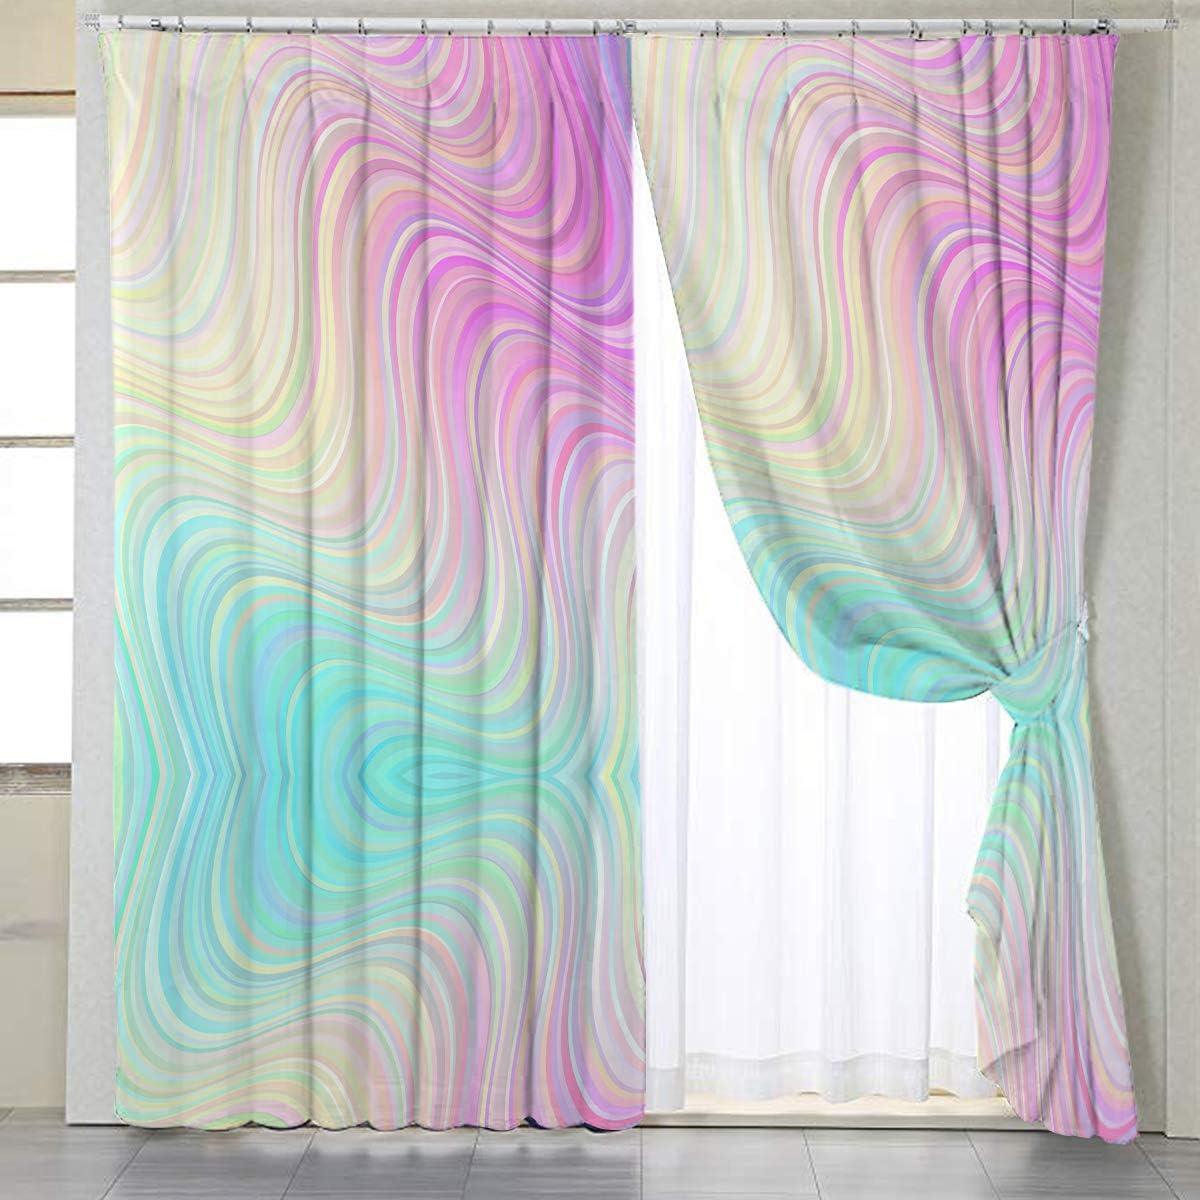 BlessLiving Printed Window Curtains Rainbow Marble Curtain Drape